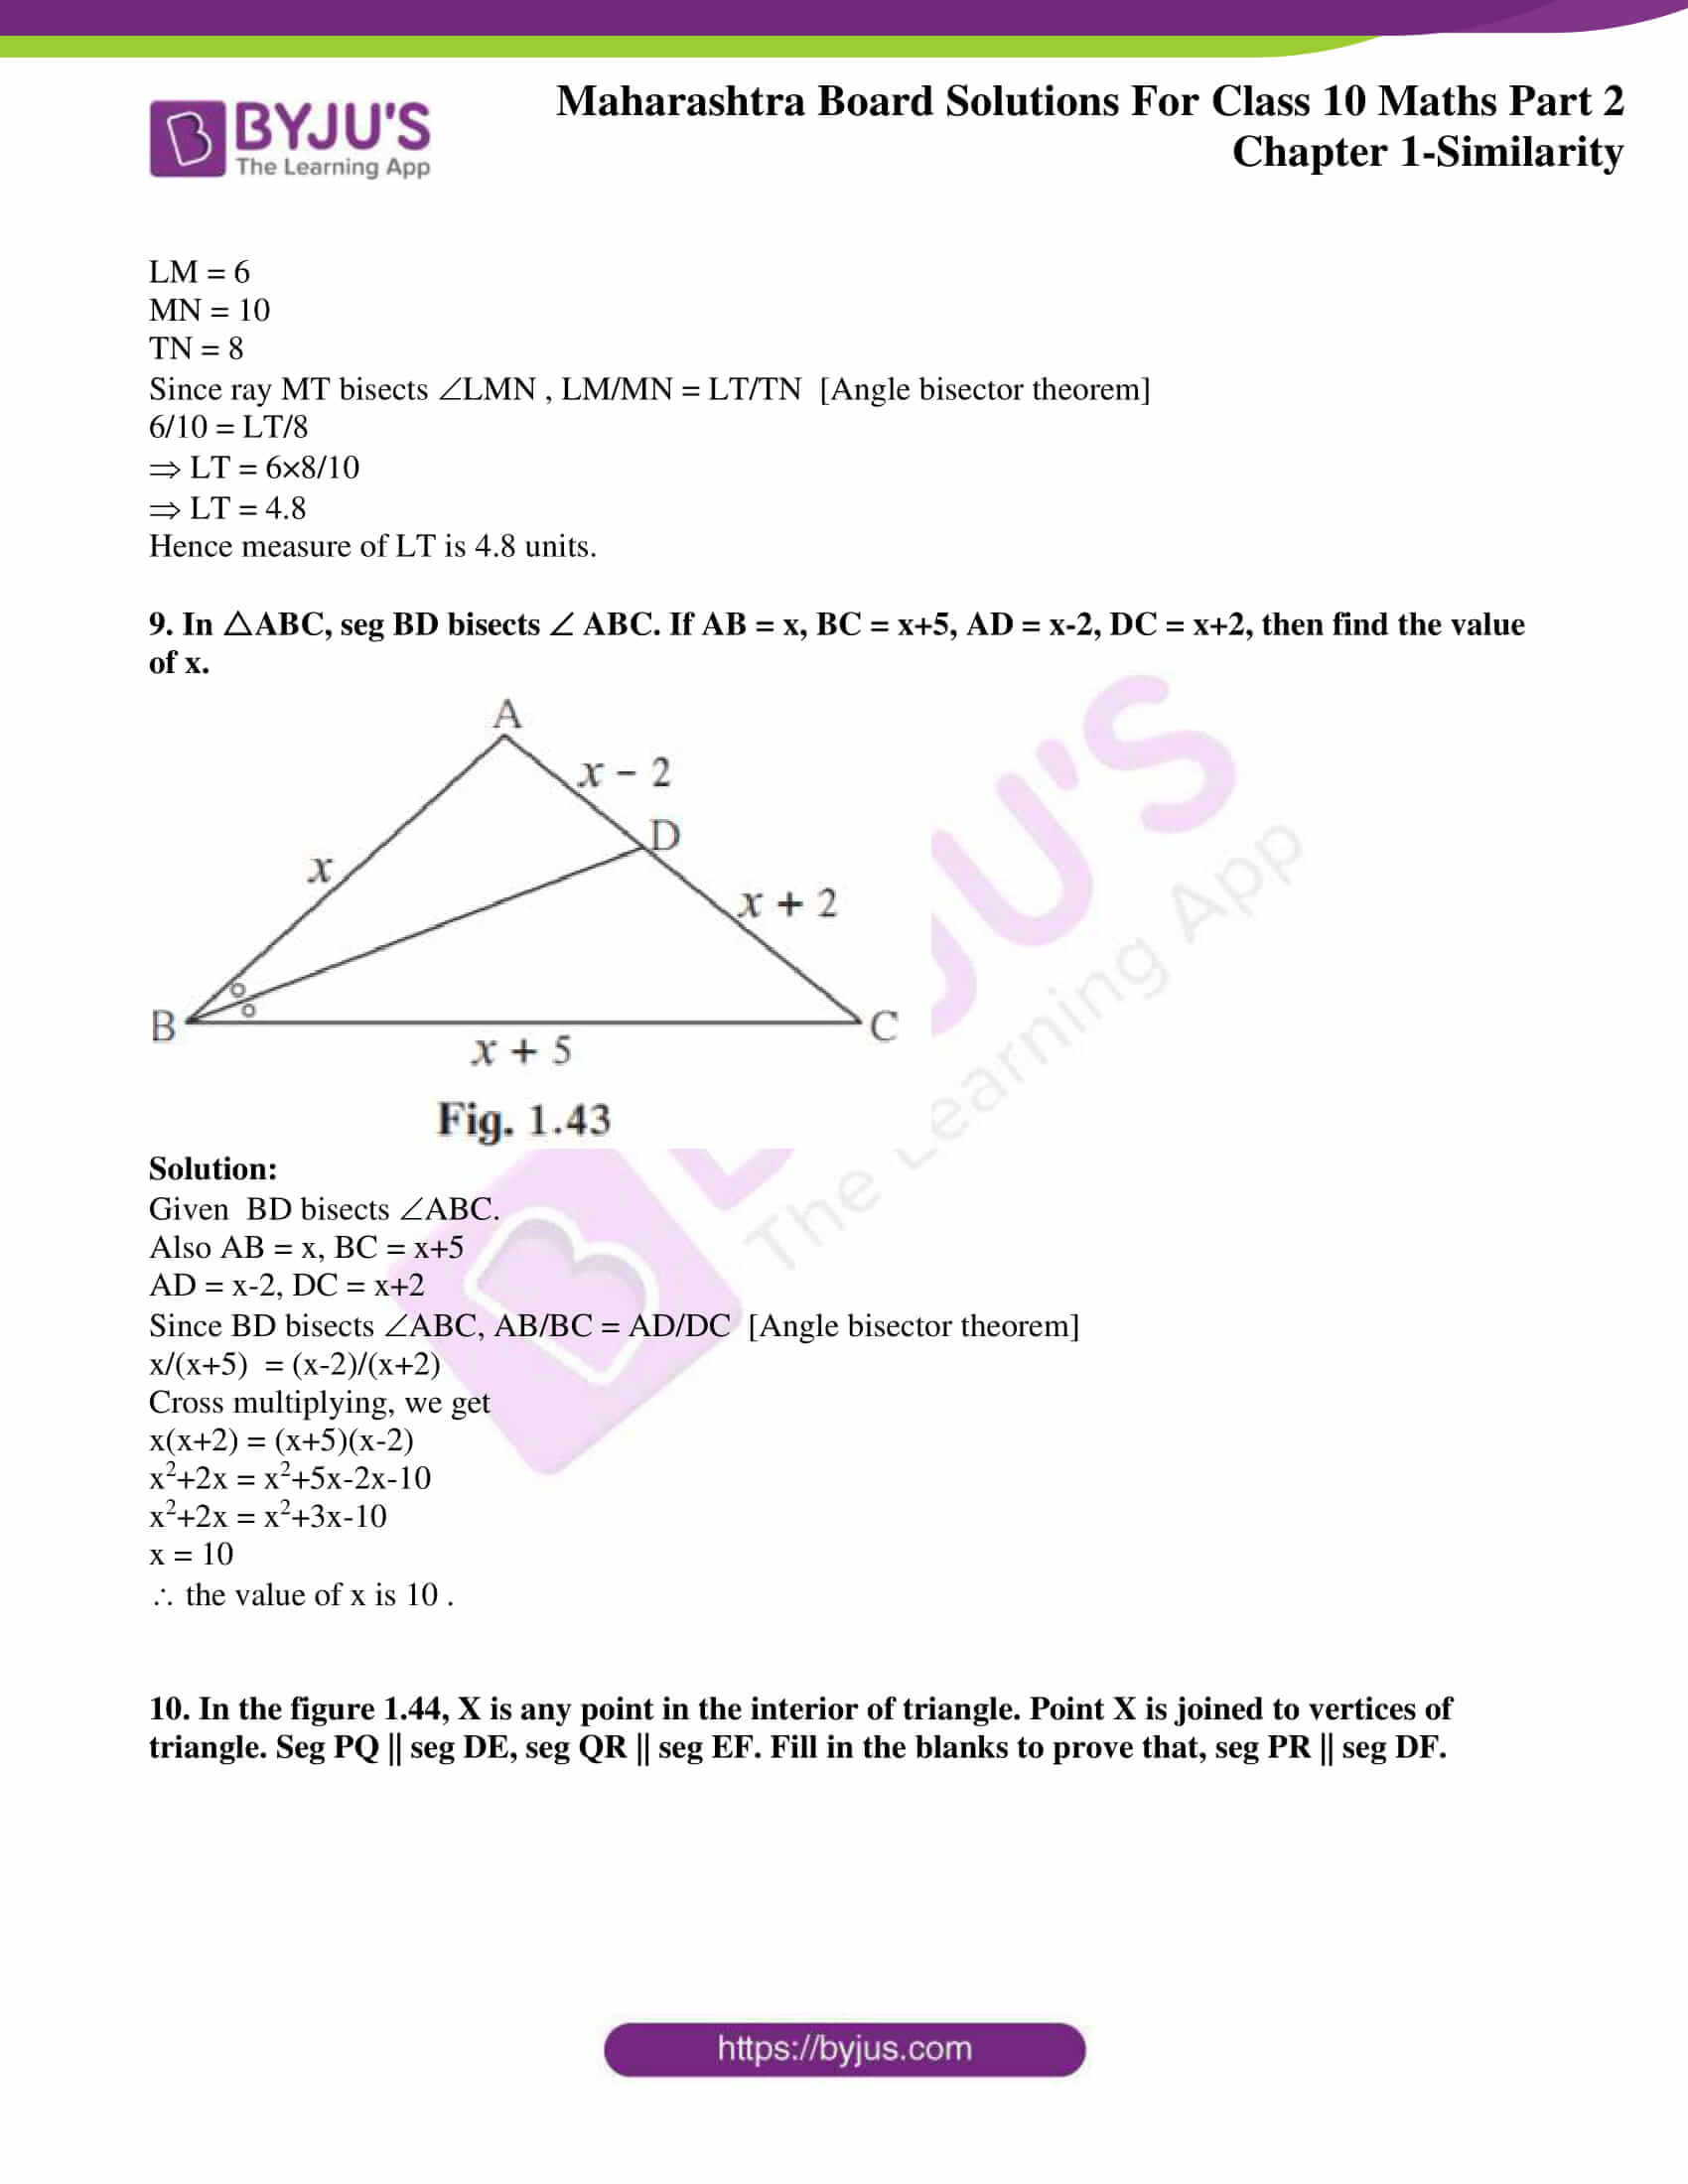 msbshse sol class 10 maths part 2 chapter 1 10